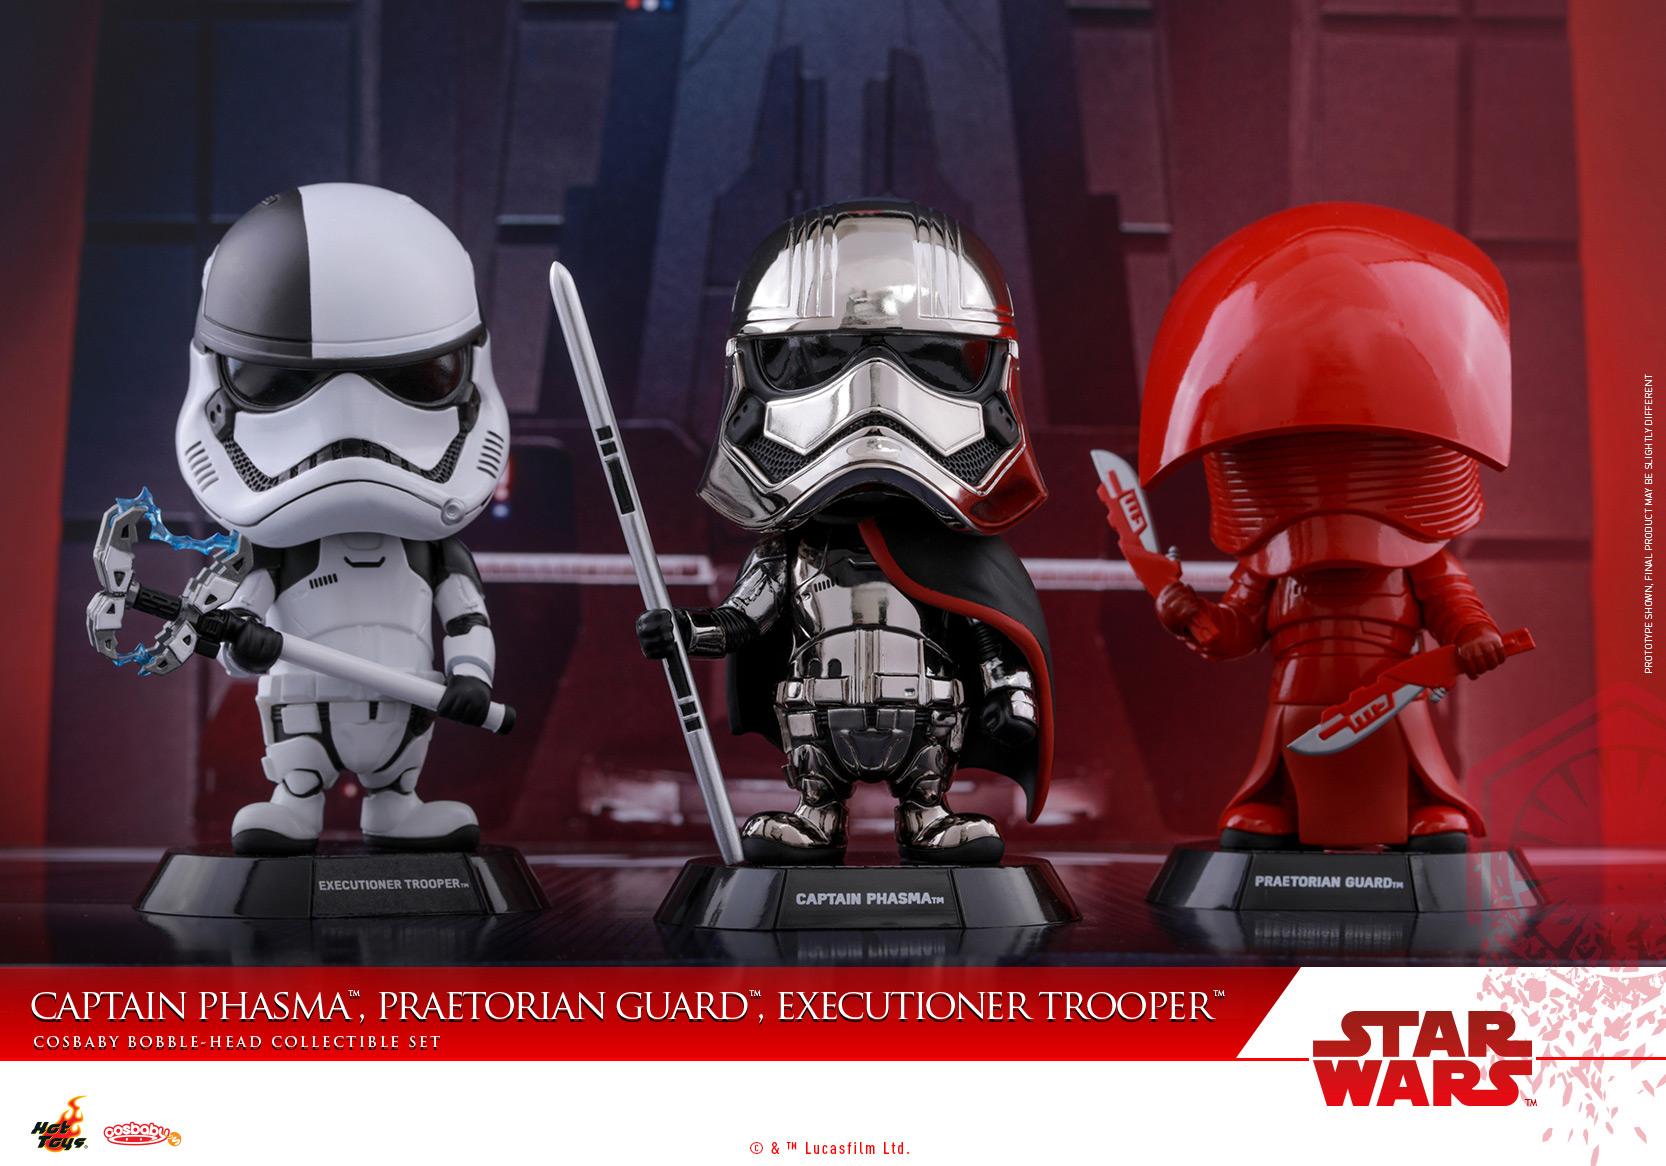 Hot-Toys---Star-Wars-The-Last-Jedi---Captain-Phasma,-Praetorian-Guard,-Executioner-Trooper-Cosbaby-Collectible-Set_PR2